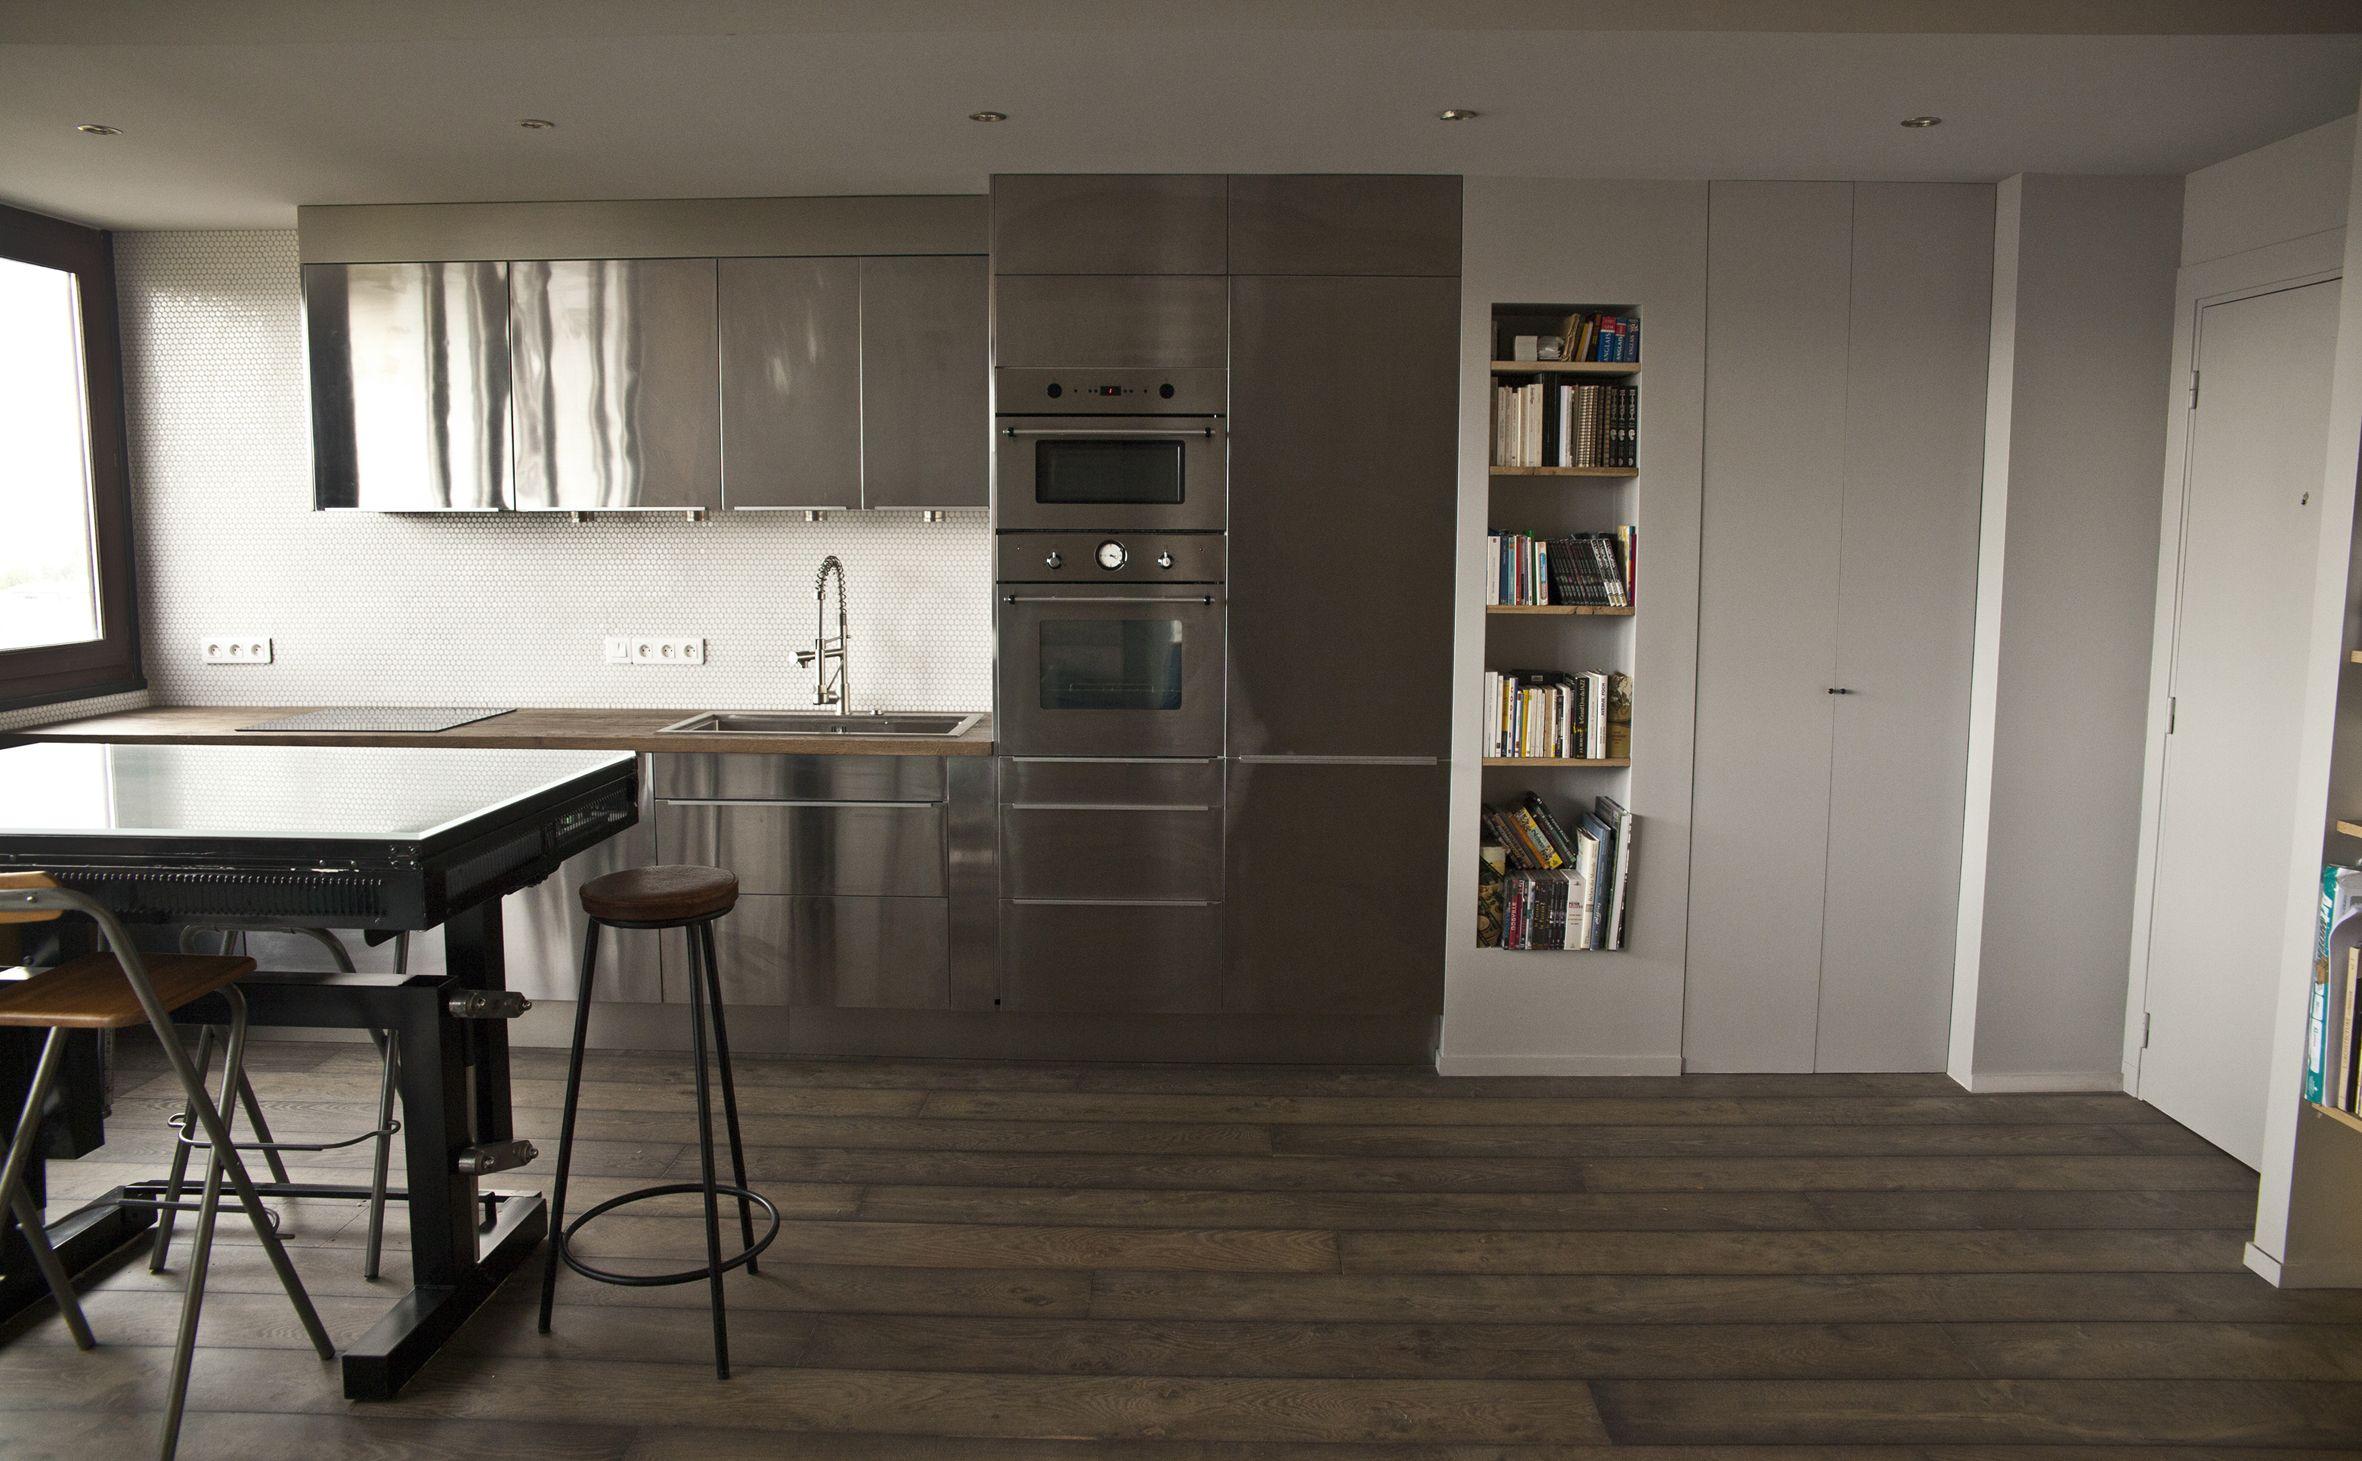 cuisine ouverte cuisine. Black Bedroom Furniture Sets. Home Design Ideas